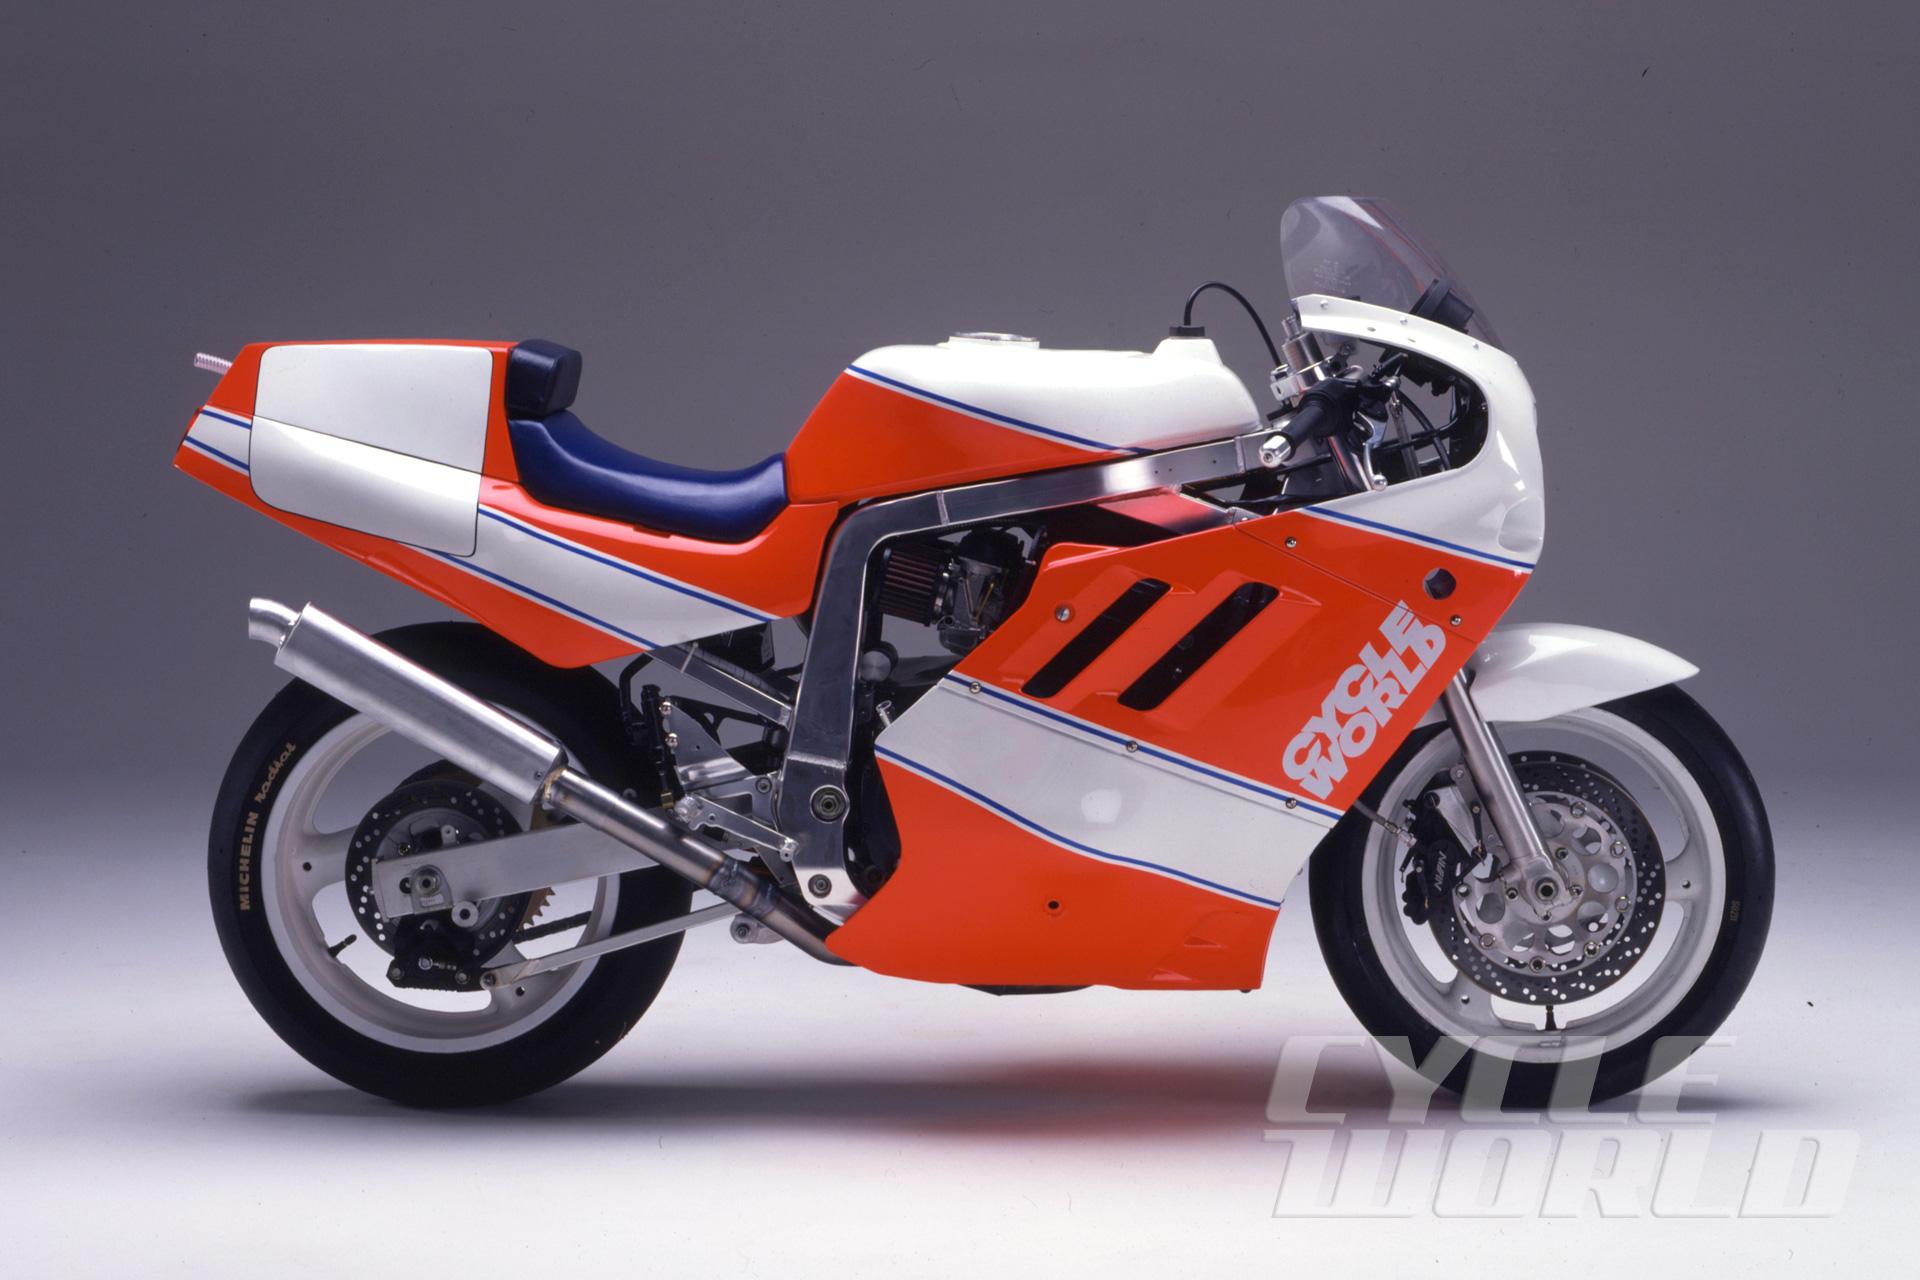 Team Cycle World Project Suzuki GSX-R 1100 Endurance Racer